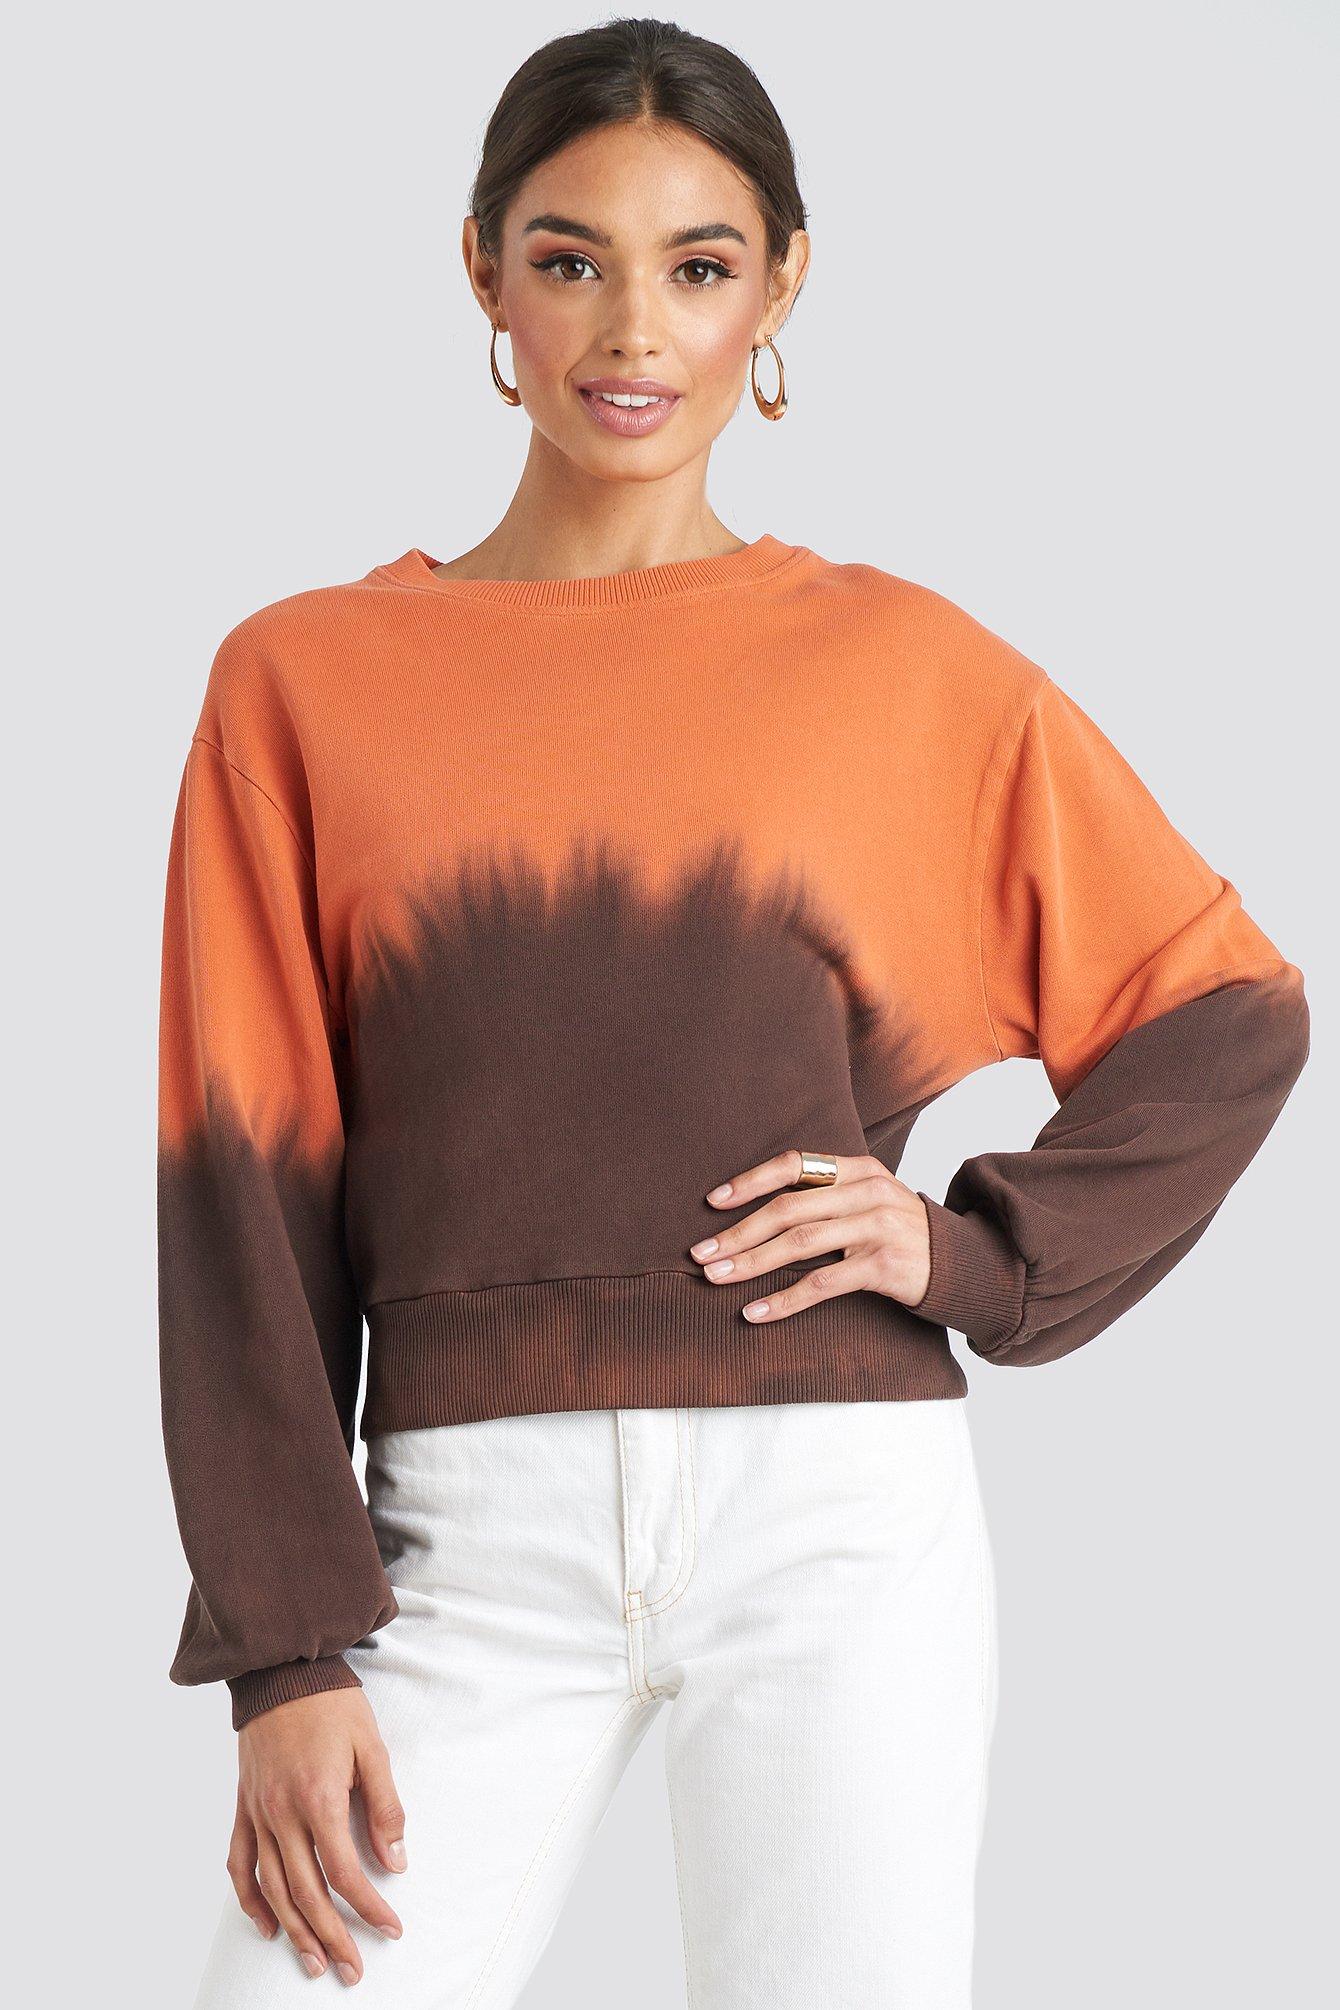 na-kd -  Tie Dye Oversized Cropped Sweatshirt - Brown,Orange